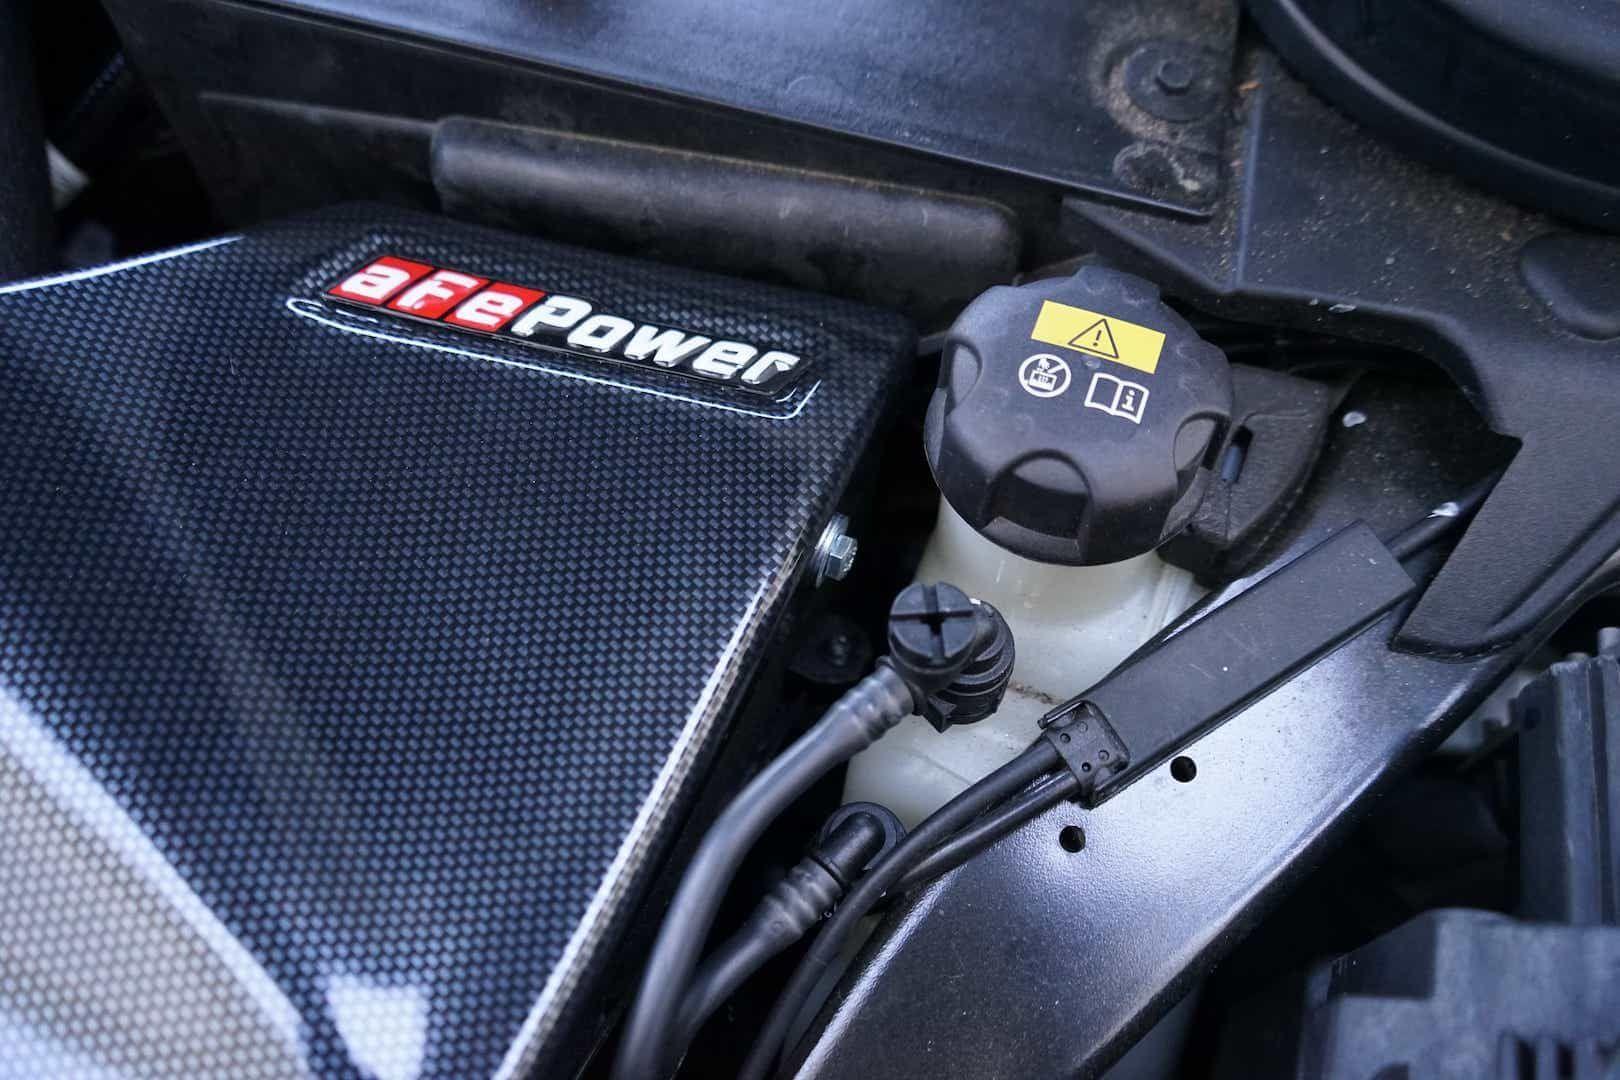 F56 Mini Cooper S Afe Intake Mini Cooper S Magnum Force Cold Air Intake